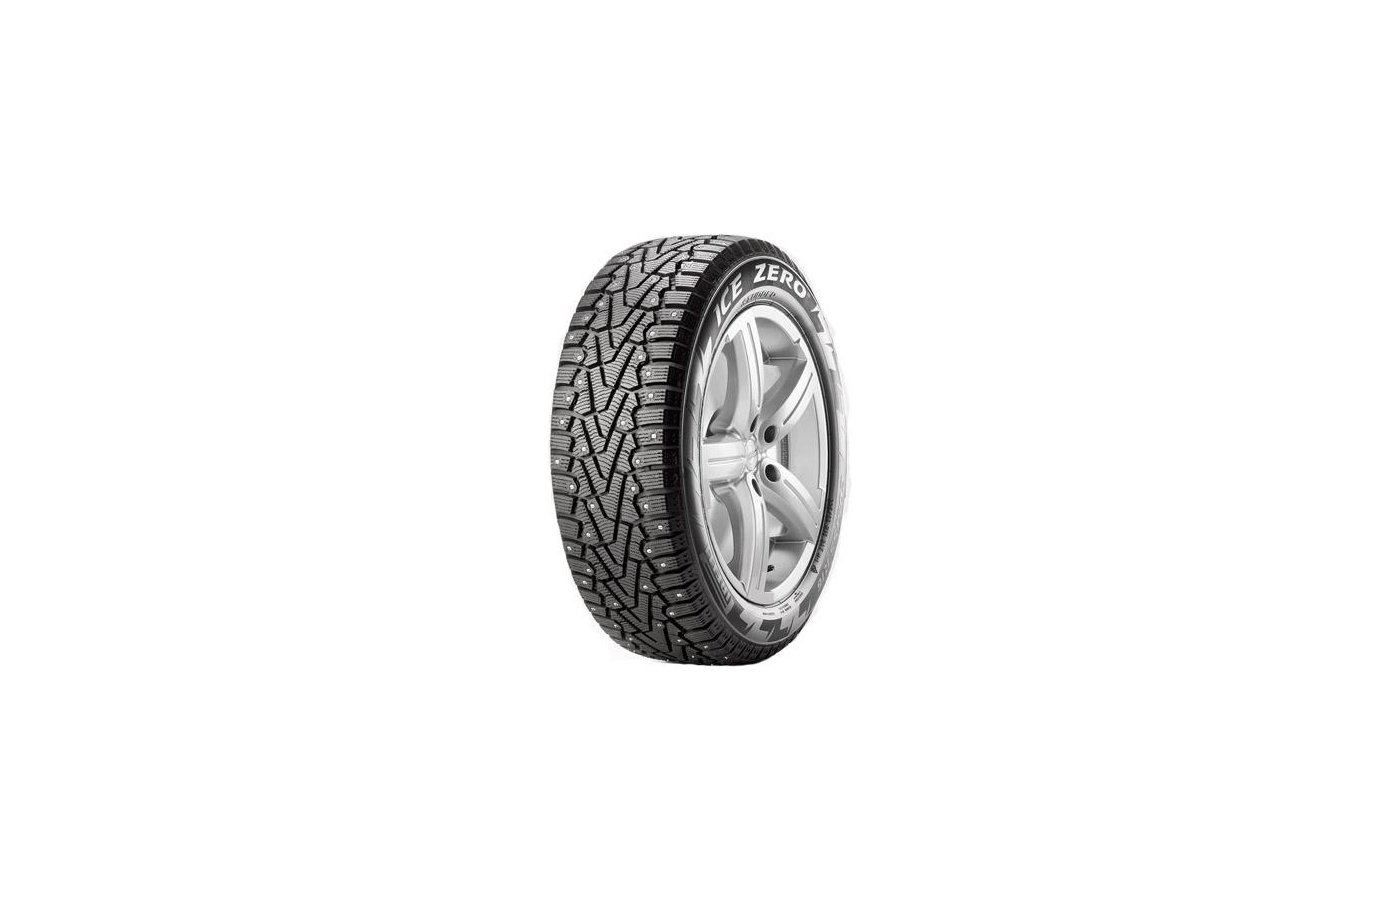 Шина Pirelli Winter Ice Zero 215/70 R16 TL 104T XL шип